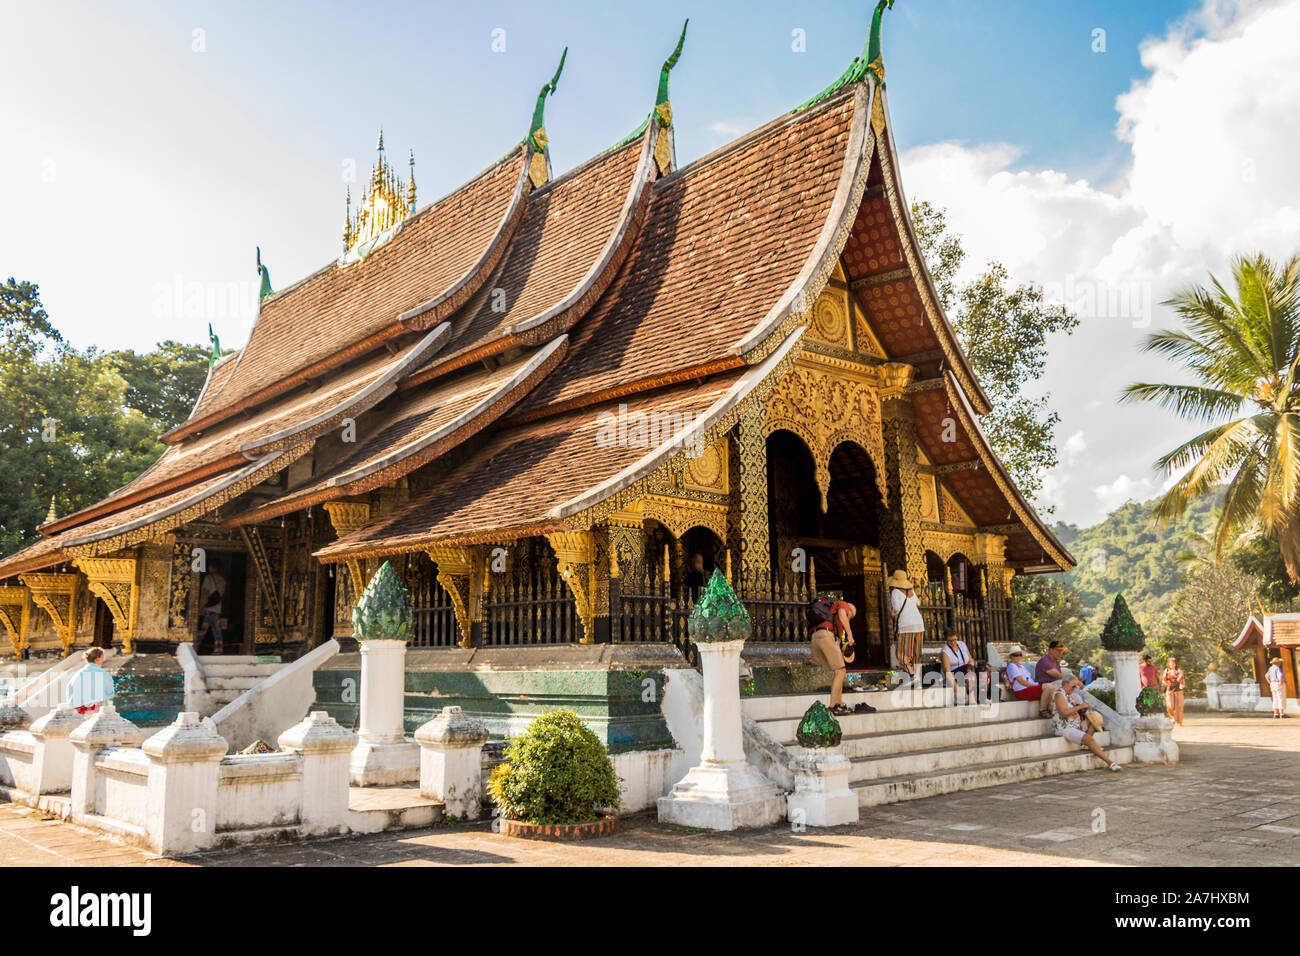 Wat Xieng Thong, temple of the Golden City, a Buddhist temple in Luang Prabang, Laos. Vat Visoun Stock Photo